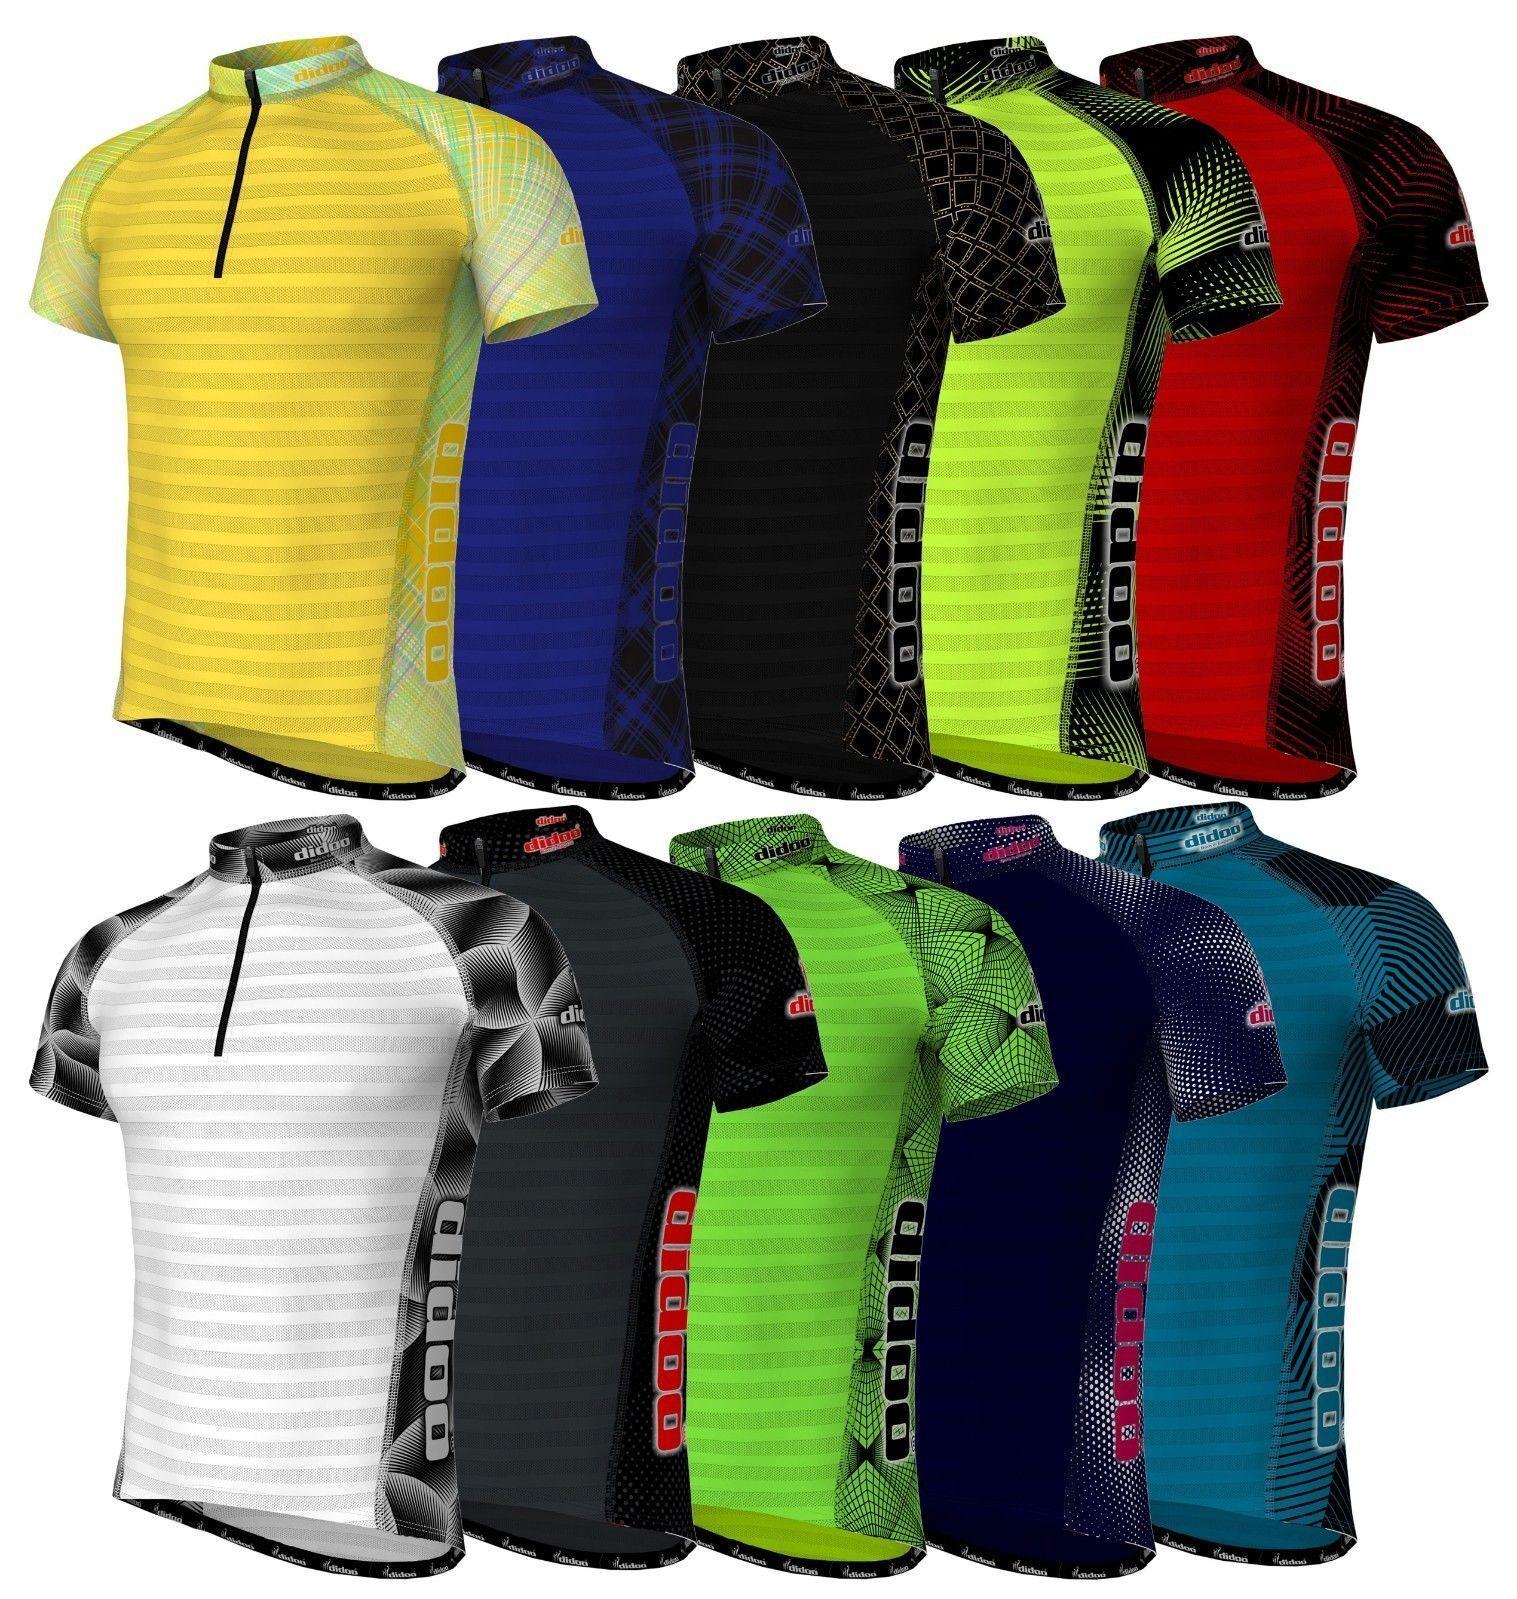 Didoo Men's Cycling Jerseys Breathable Short Sleeve Tops Bik